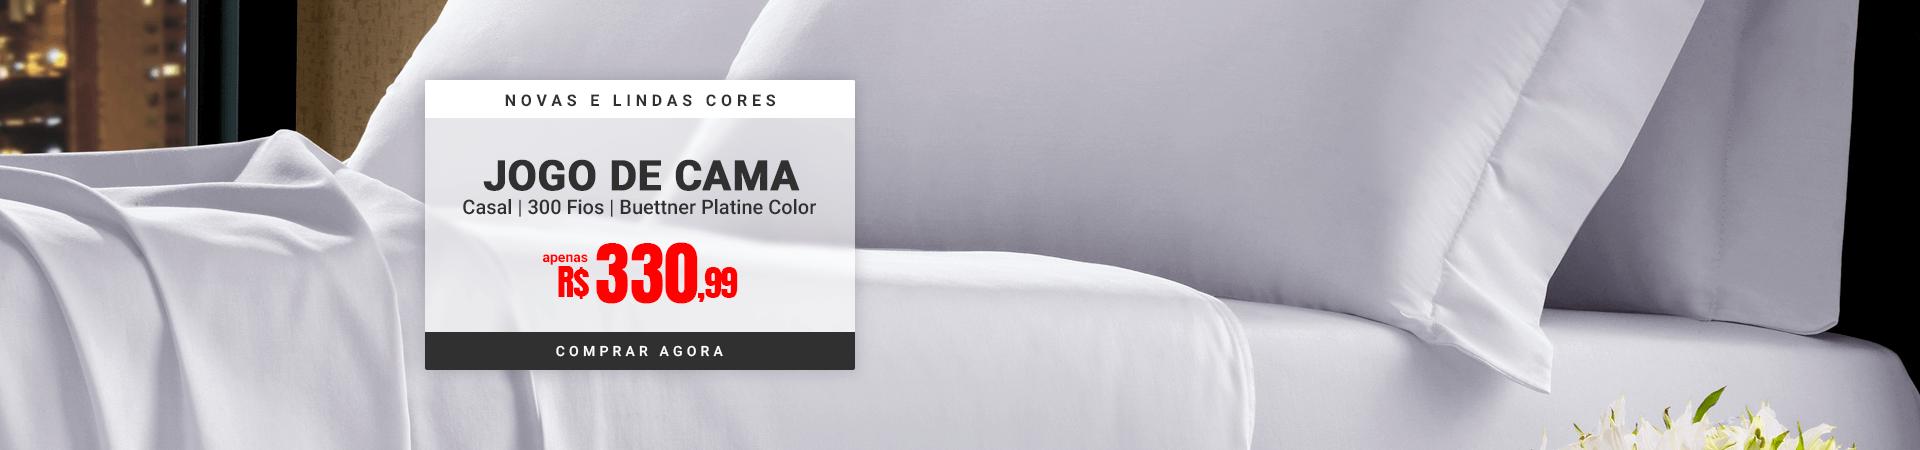 Jogo de Cama Casal 300 fios Buettner Platine Color >> Loja Buettner | Comprar Agora!